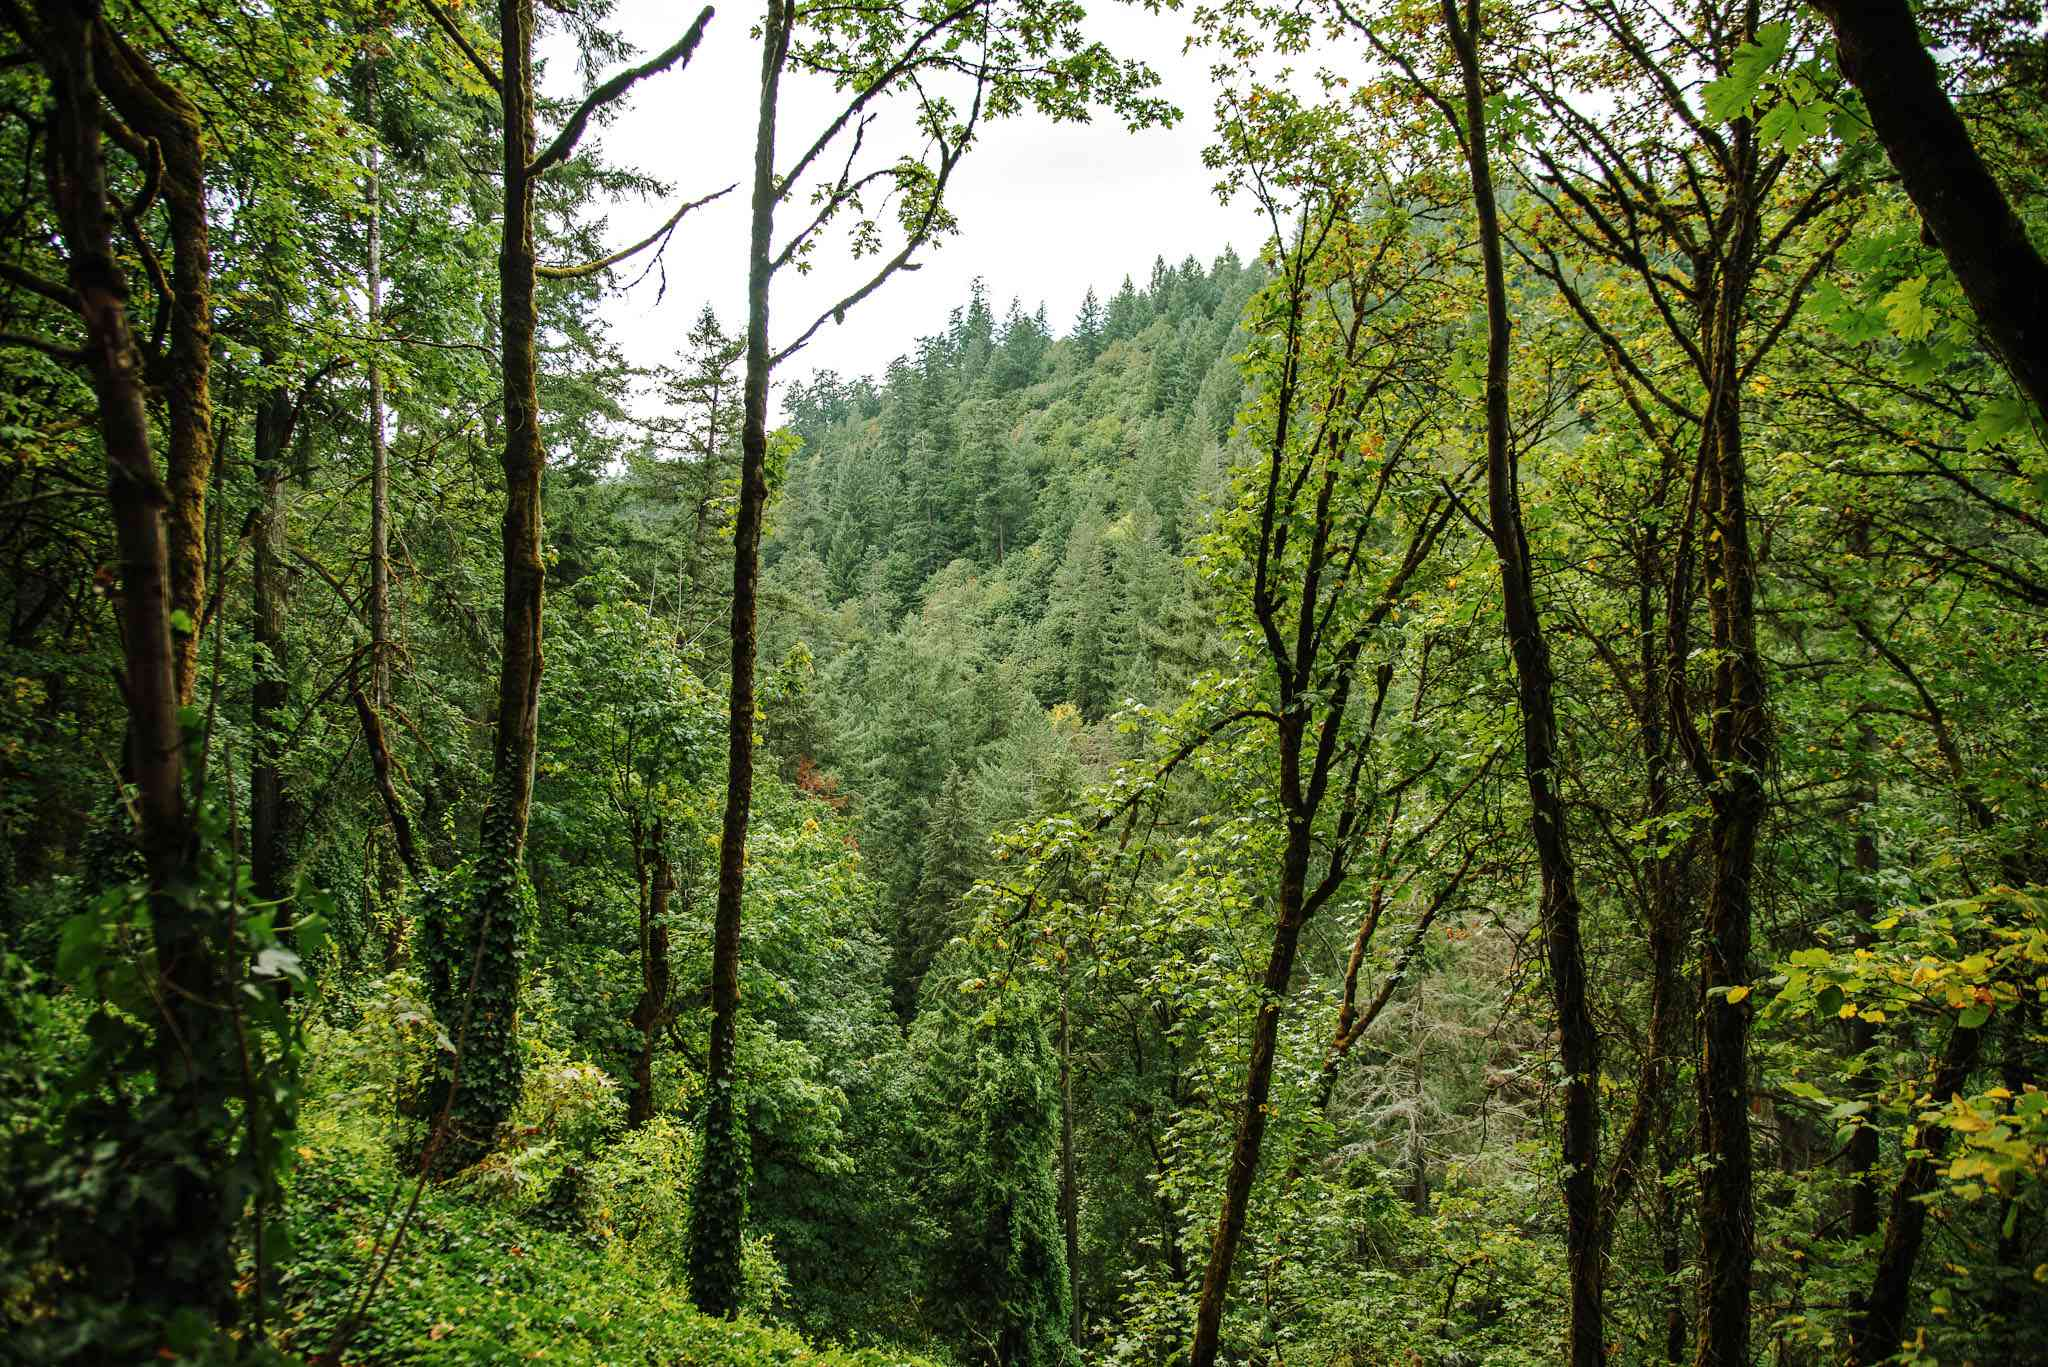 A view through lush trees